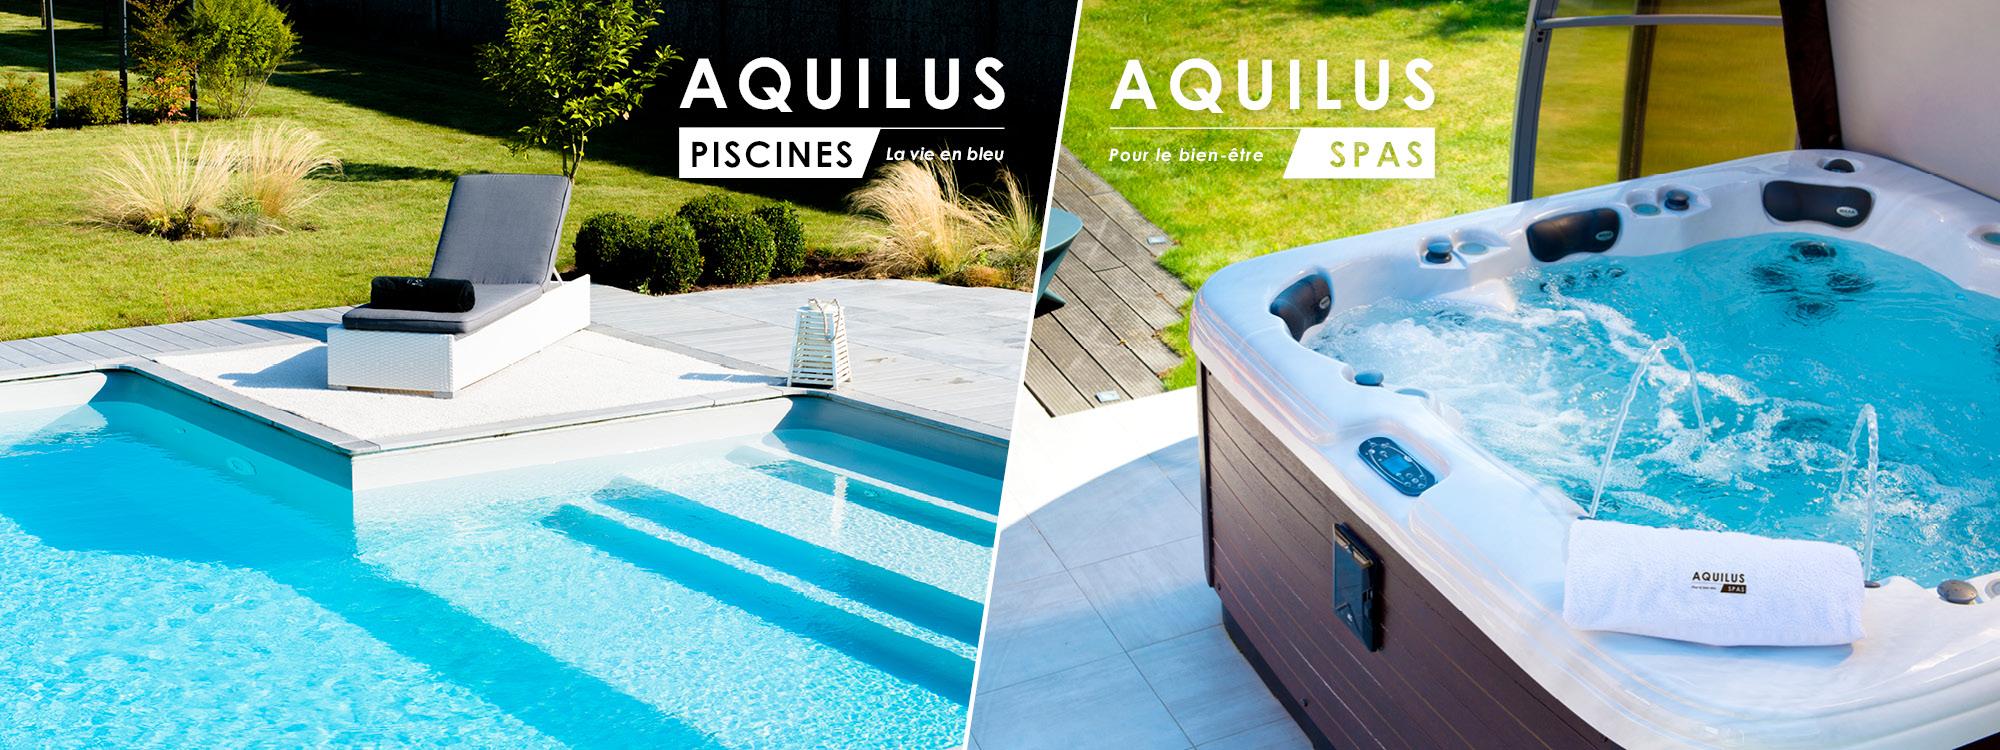 Aquilus Piscines Et Spas Bourges à Piscine Bourges